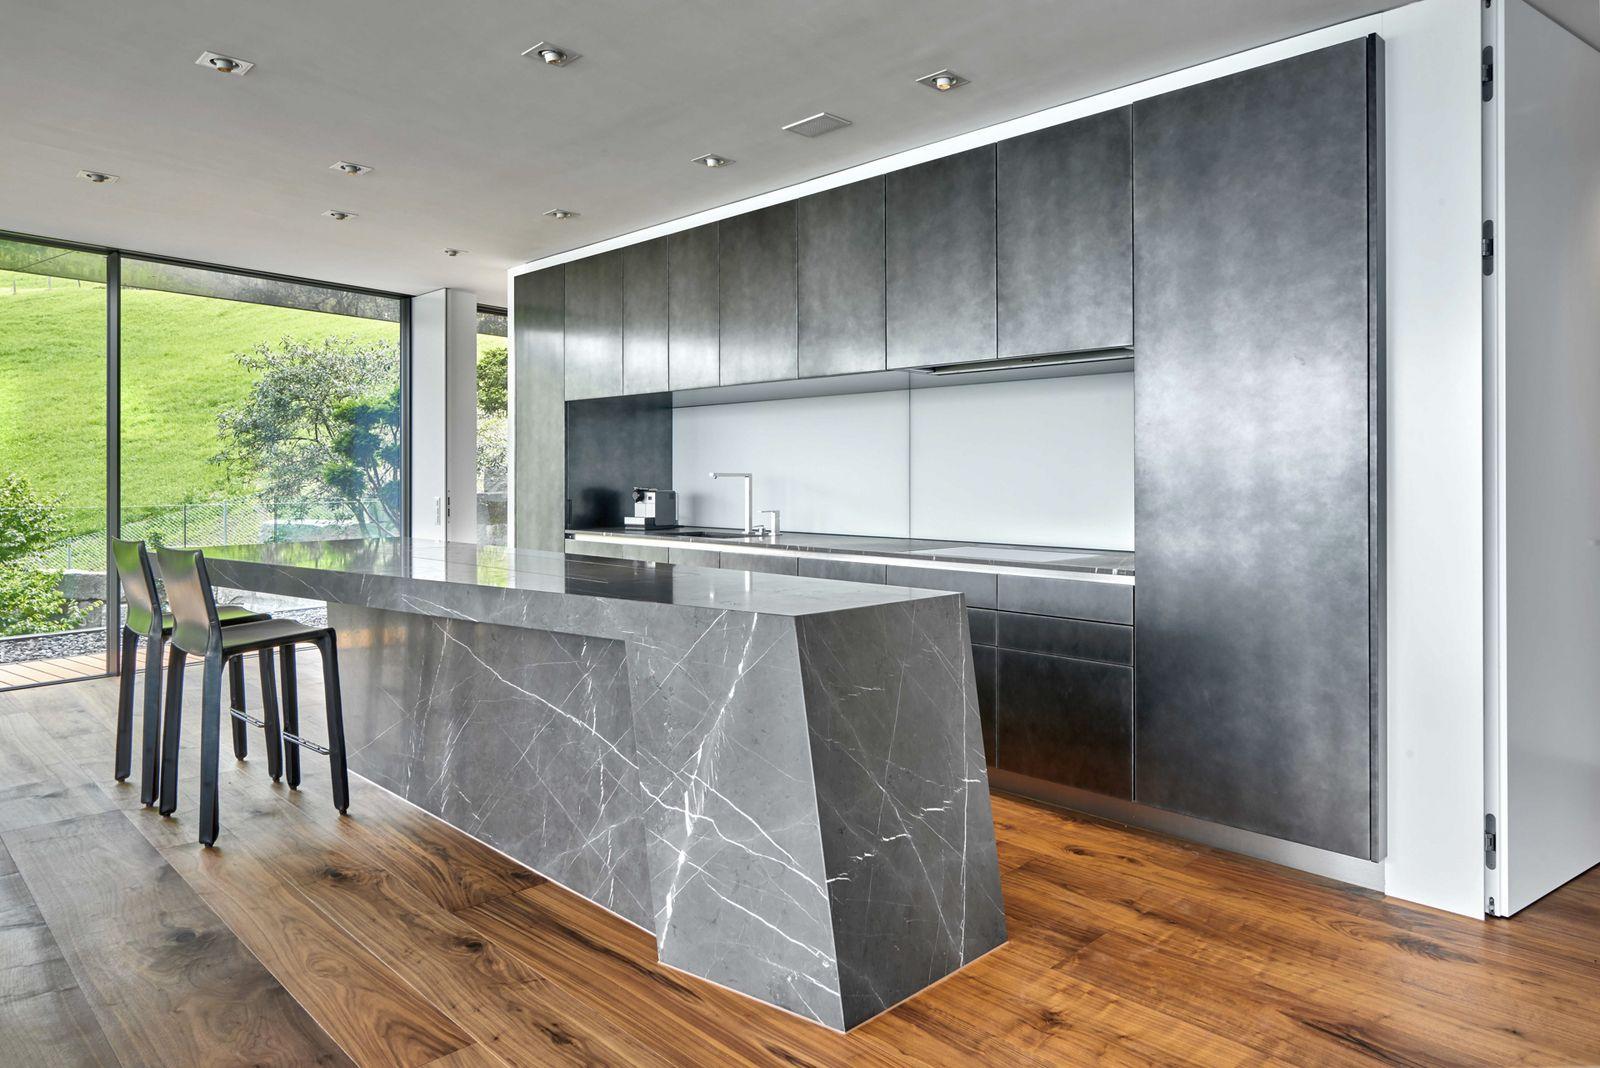 k slin innenausbau versenkbarer fernseher. Black Bedroom Furniture Sets. Home Design Ideas